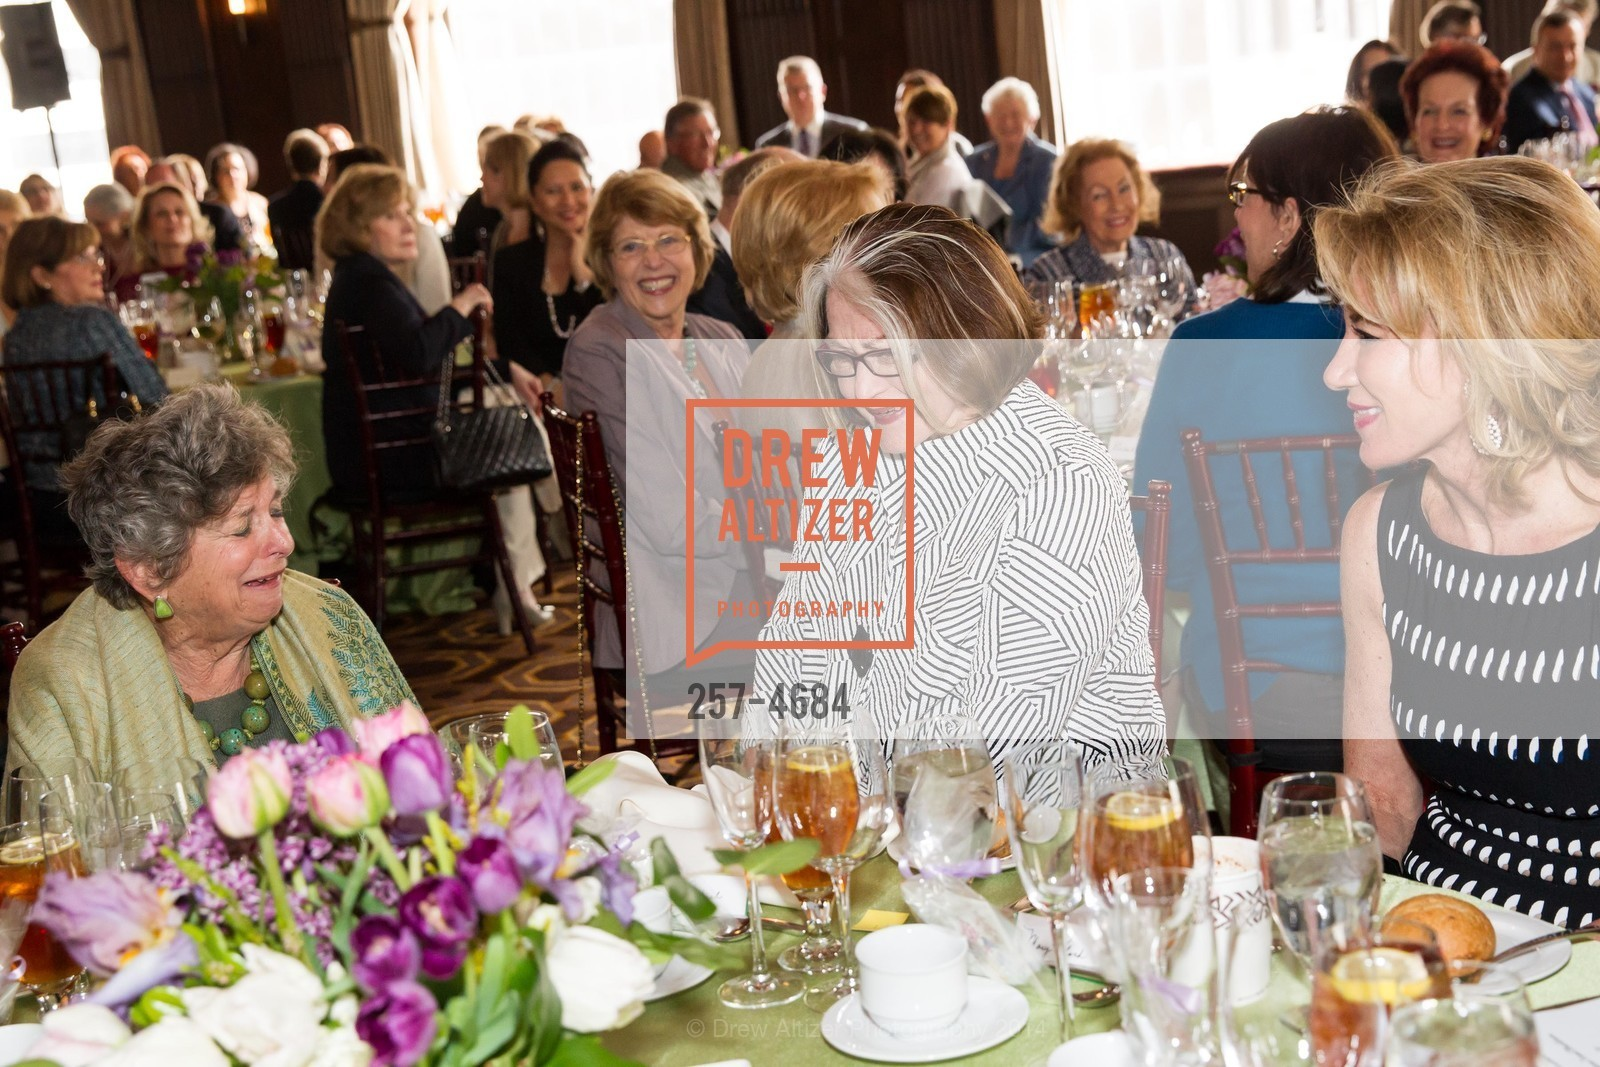 Delia Ehrlich, Katie Cardinal, Mary Poland, Photo #257-4684